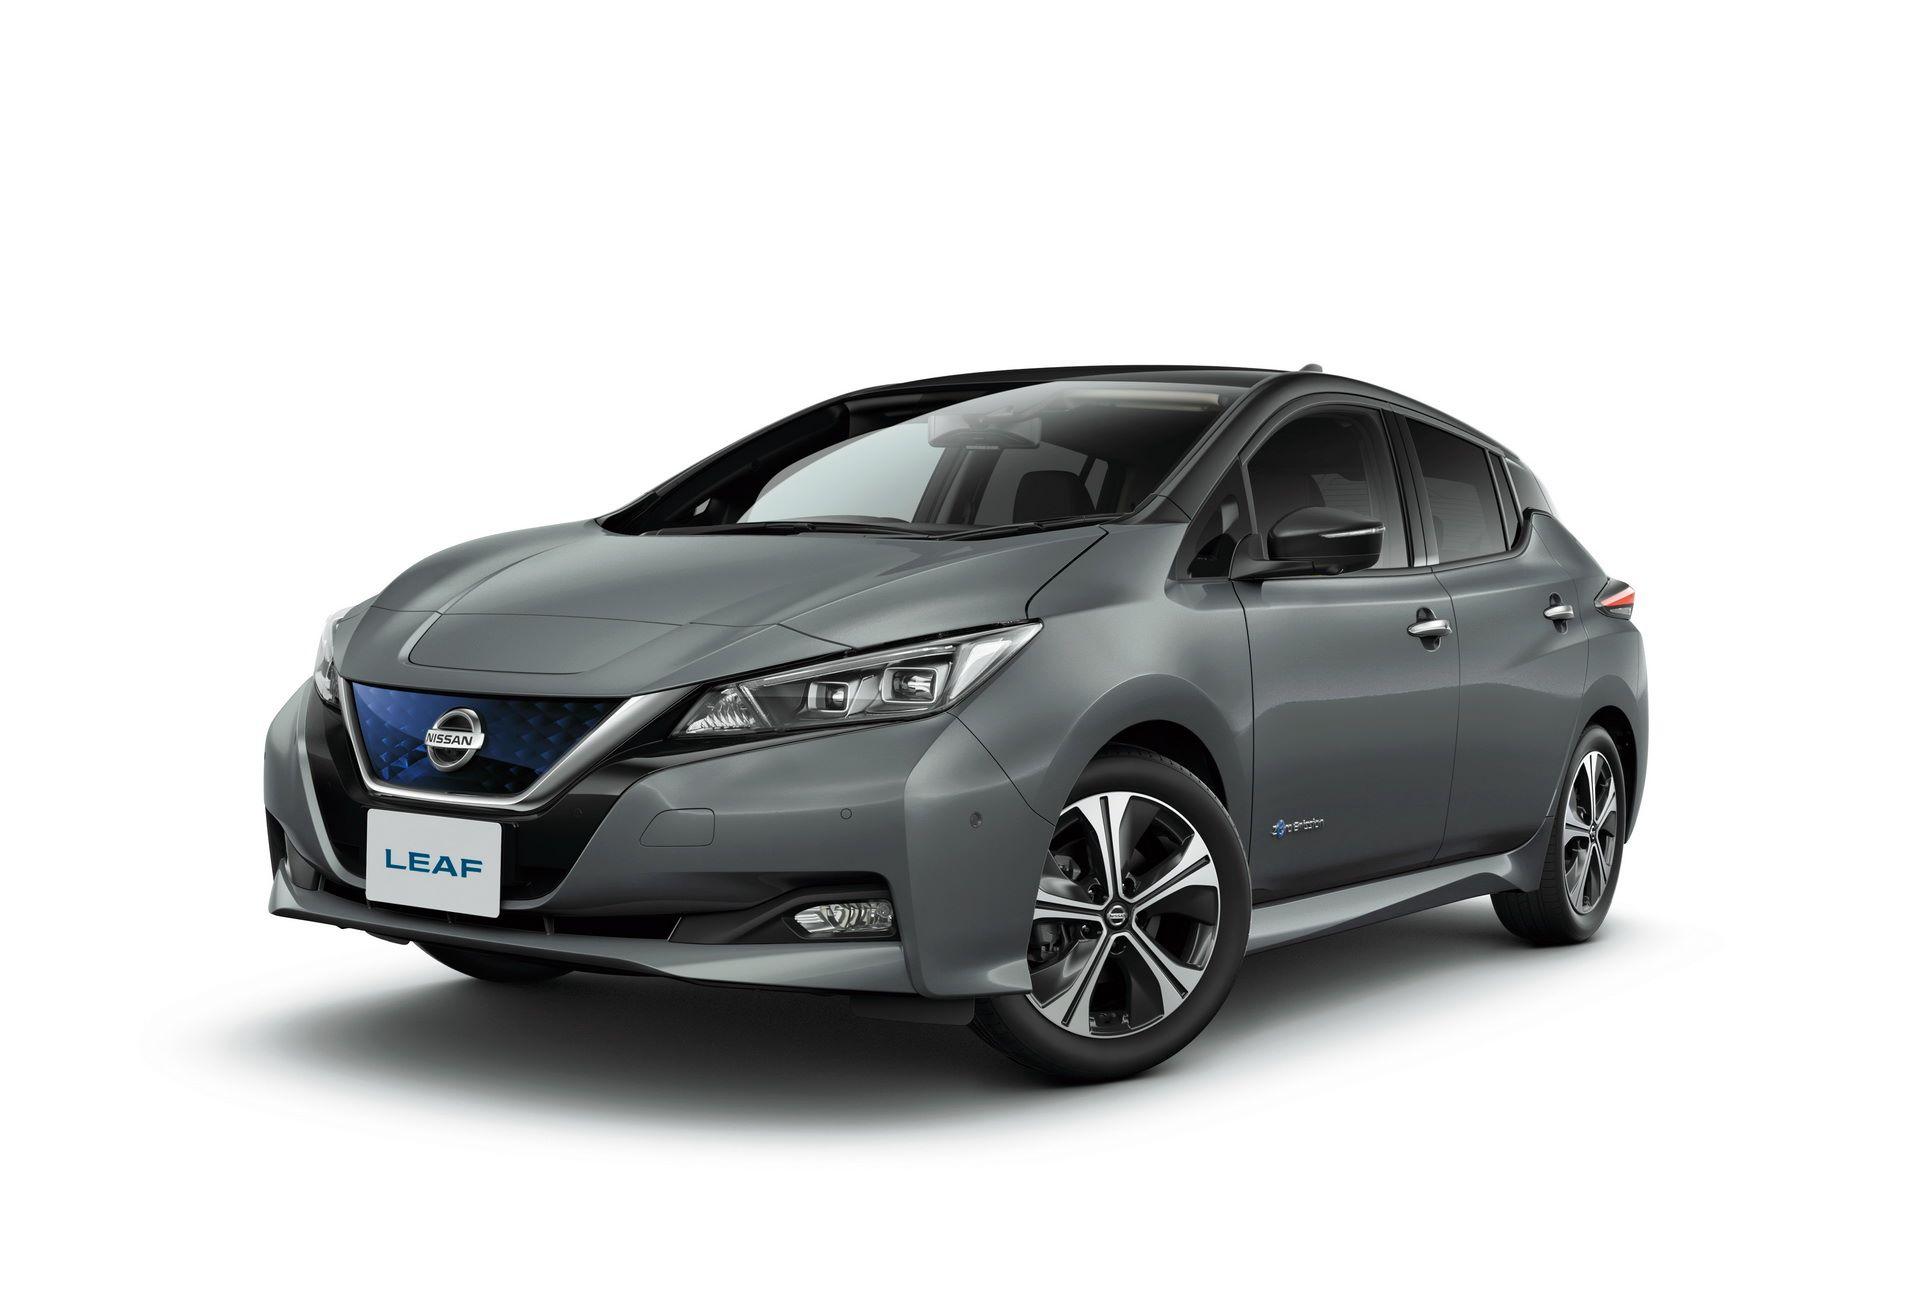 Nissan-leaf-japan-2020-4